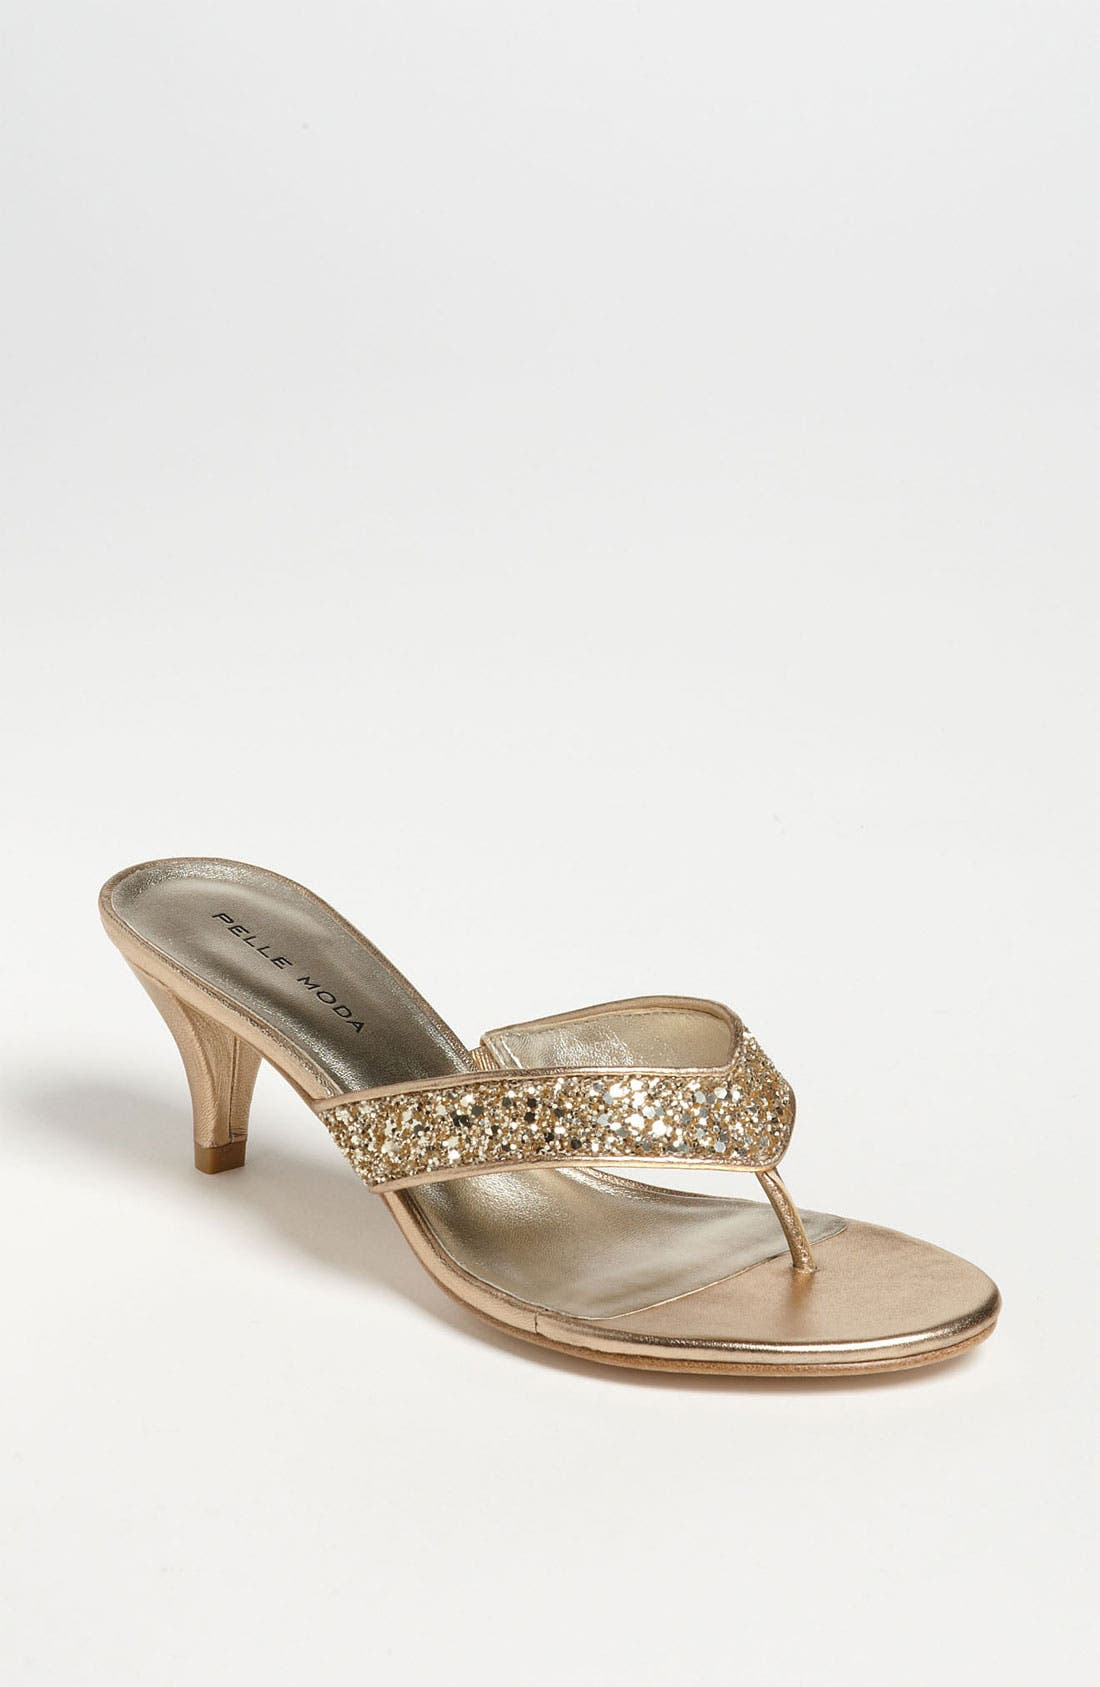 Main Image - Pelle Moda 'Hadlin' Sandal